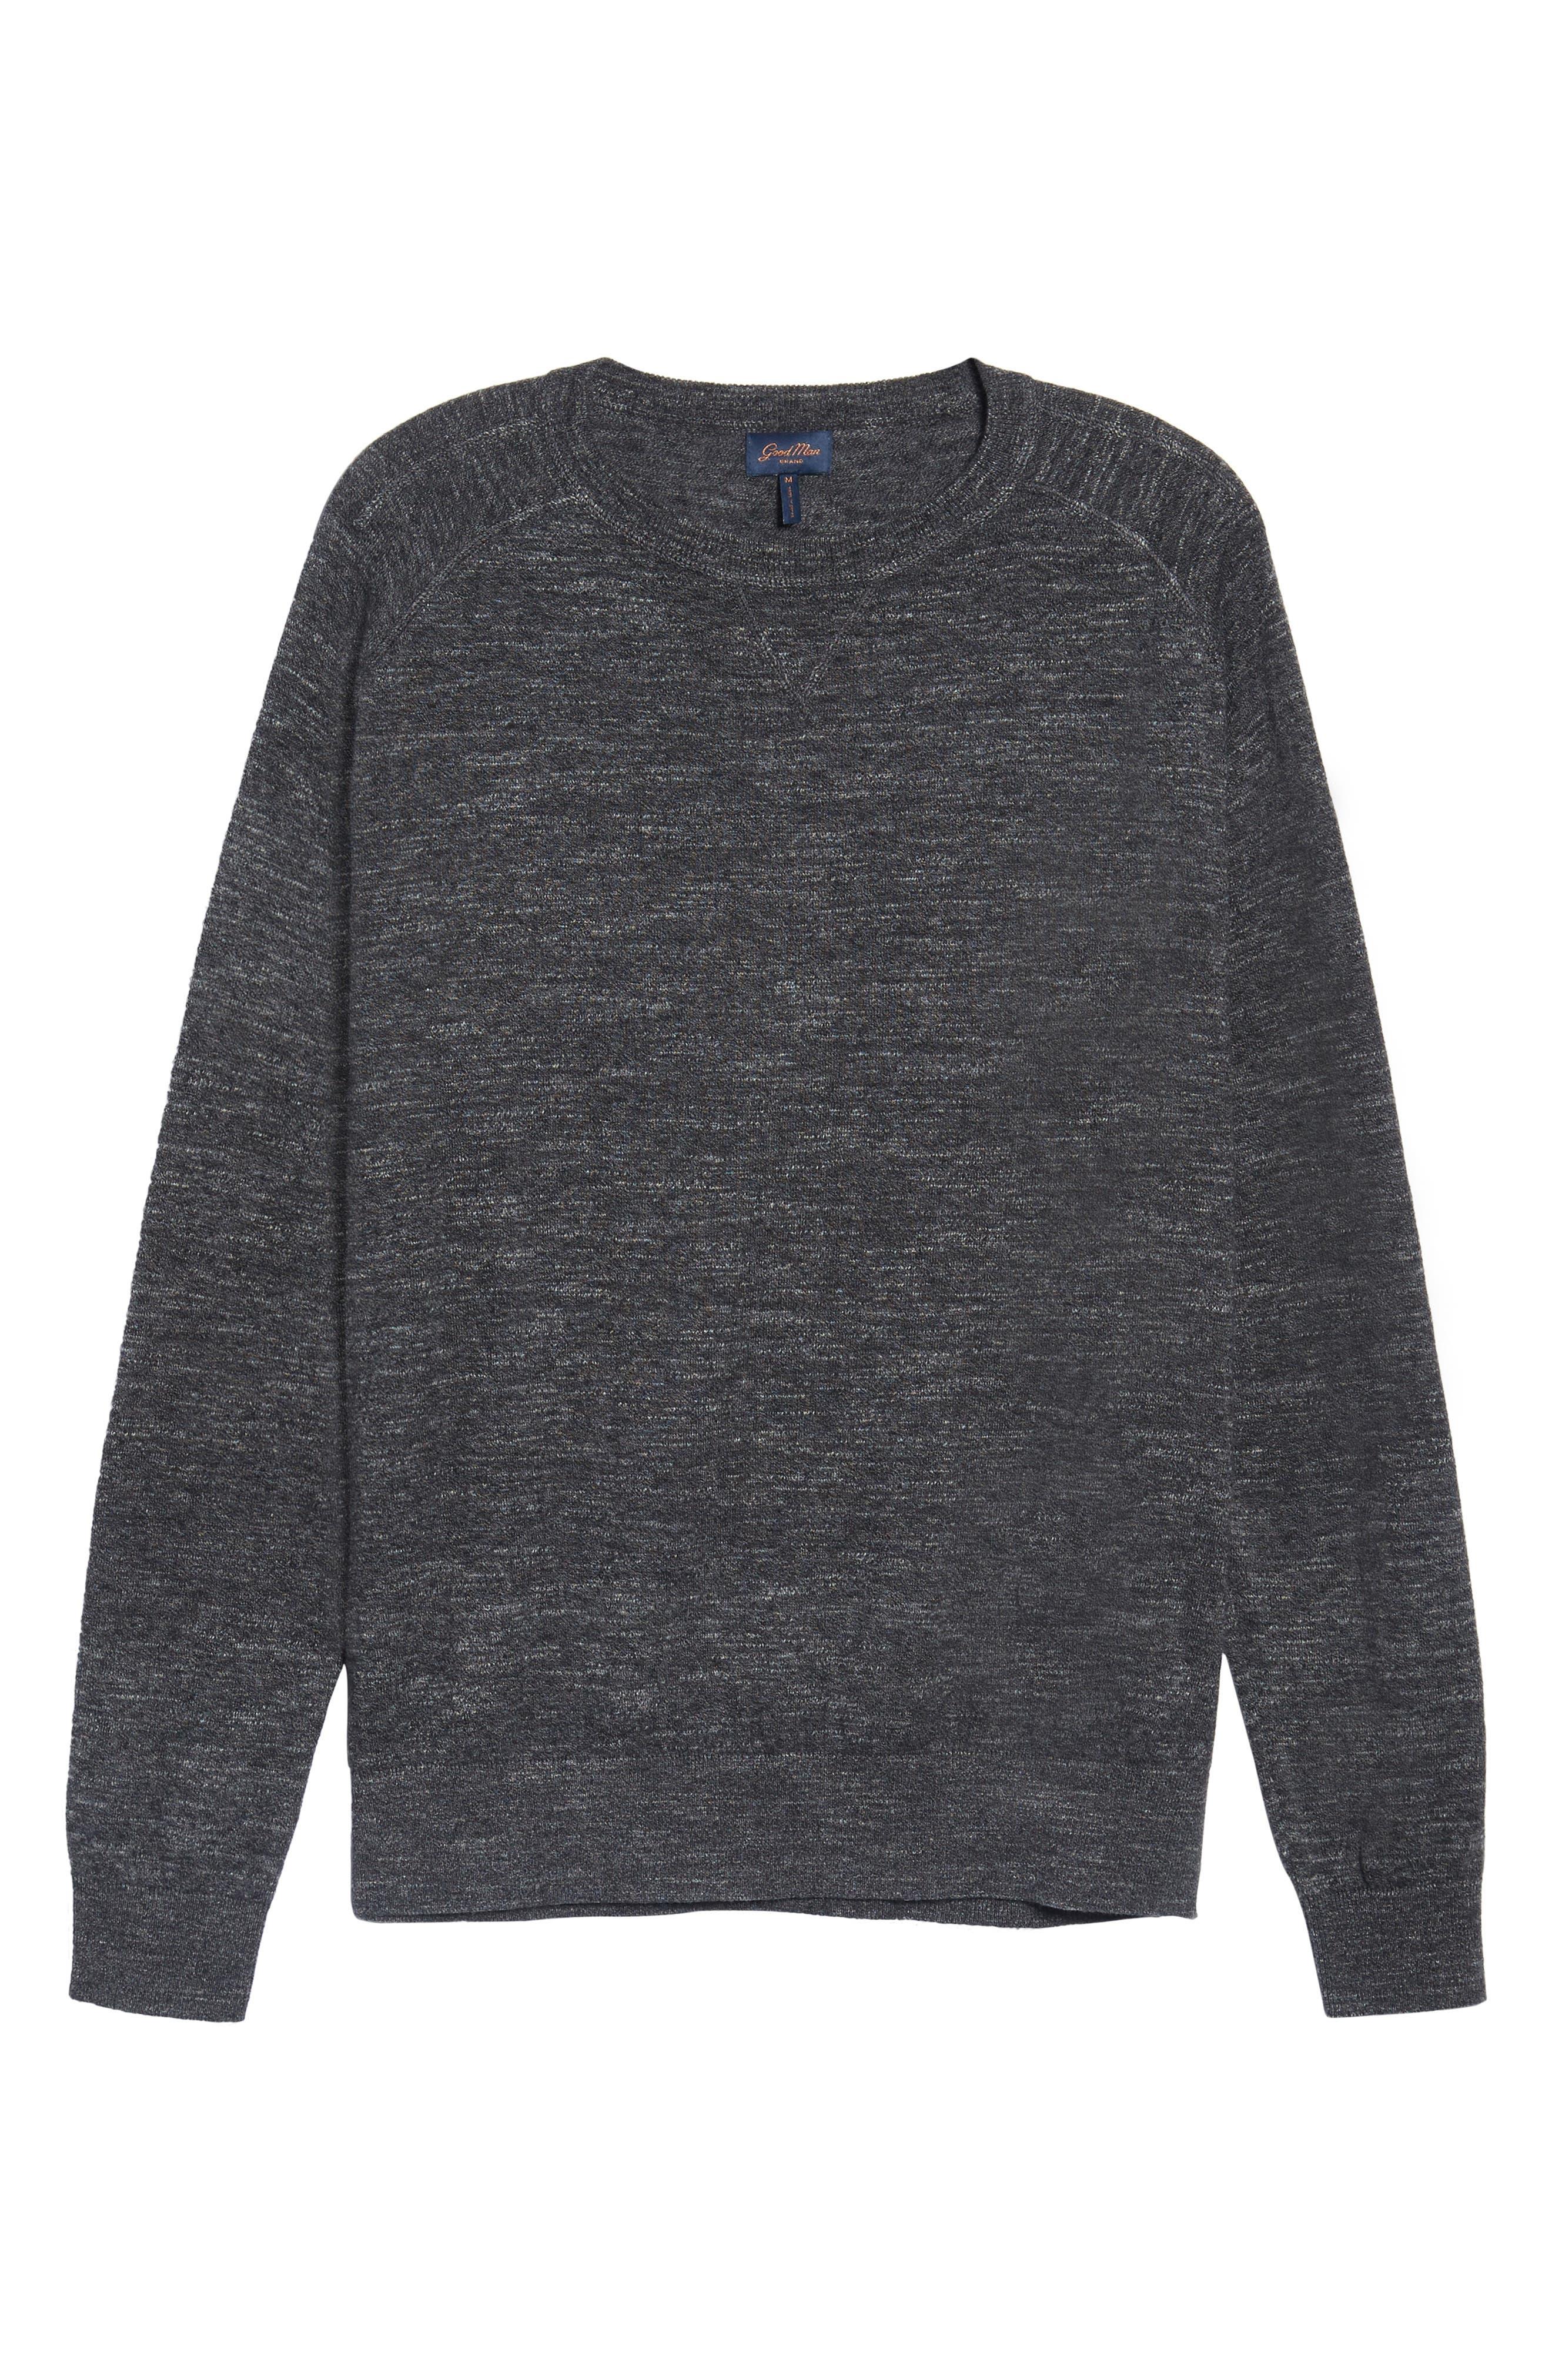 Slub Pullover Sweater,                             Alternate thumbnail 6, color,                             Grey